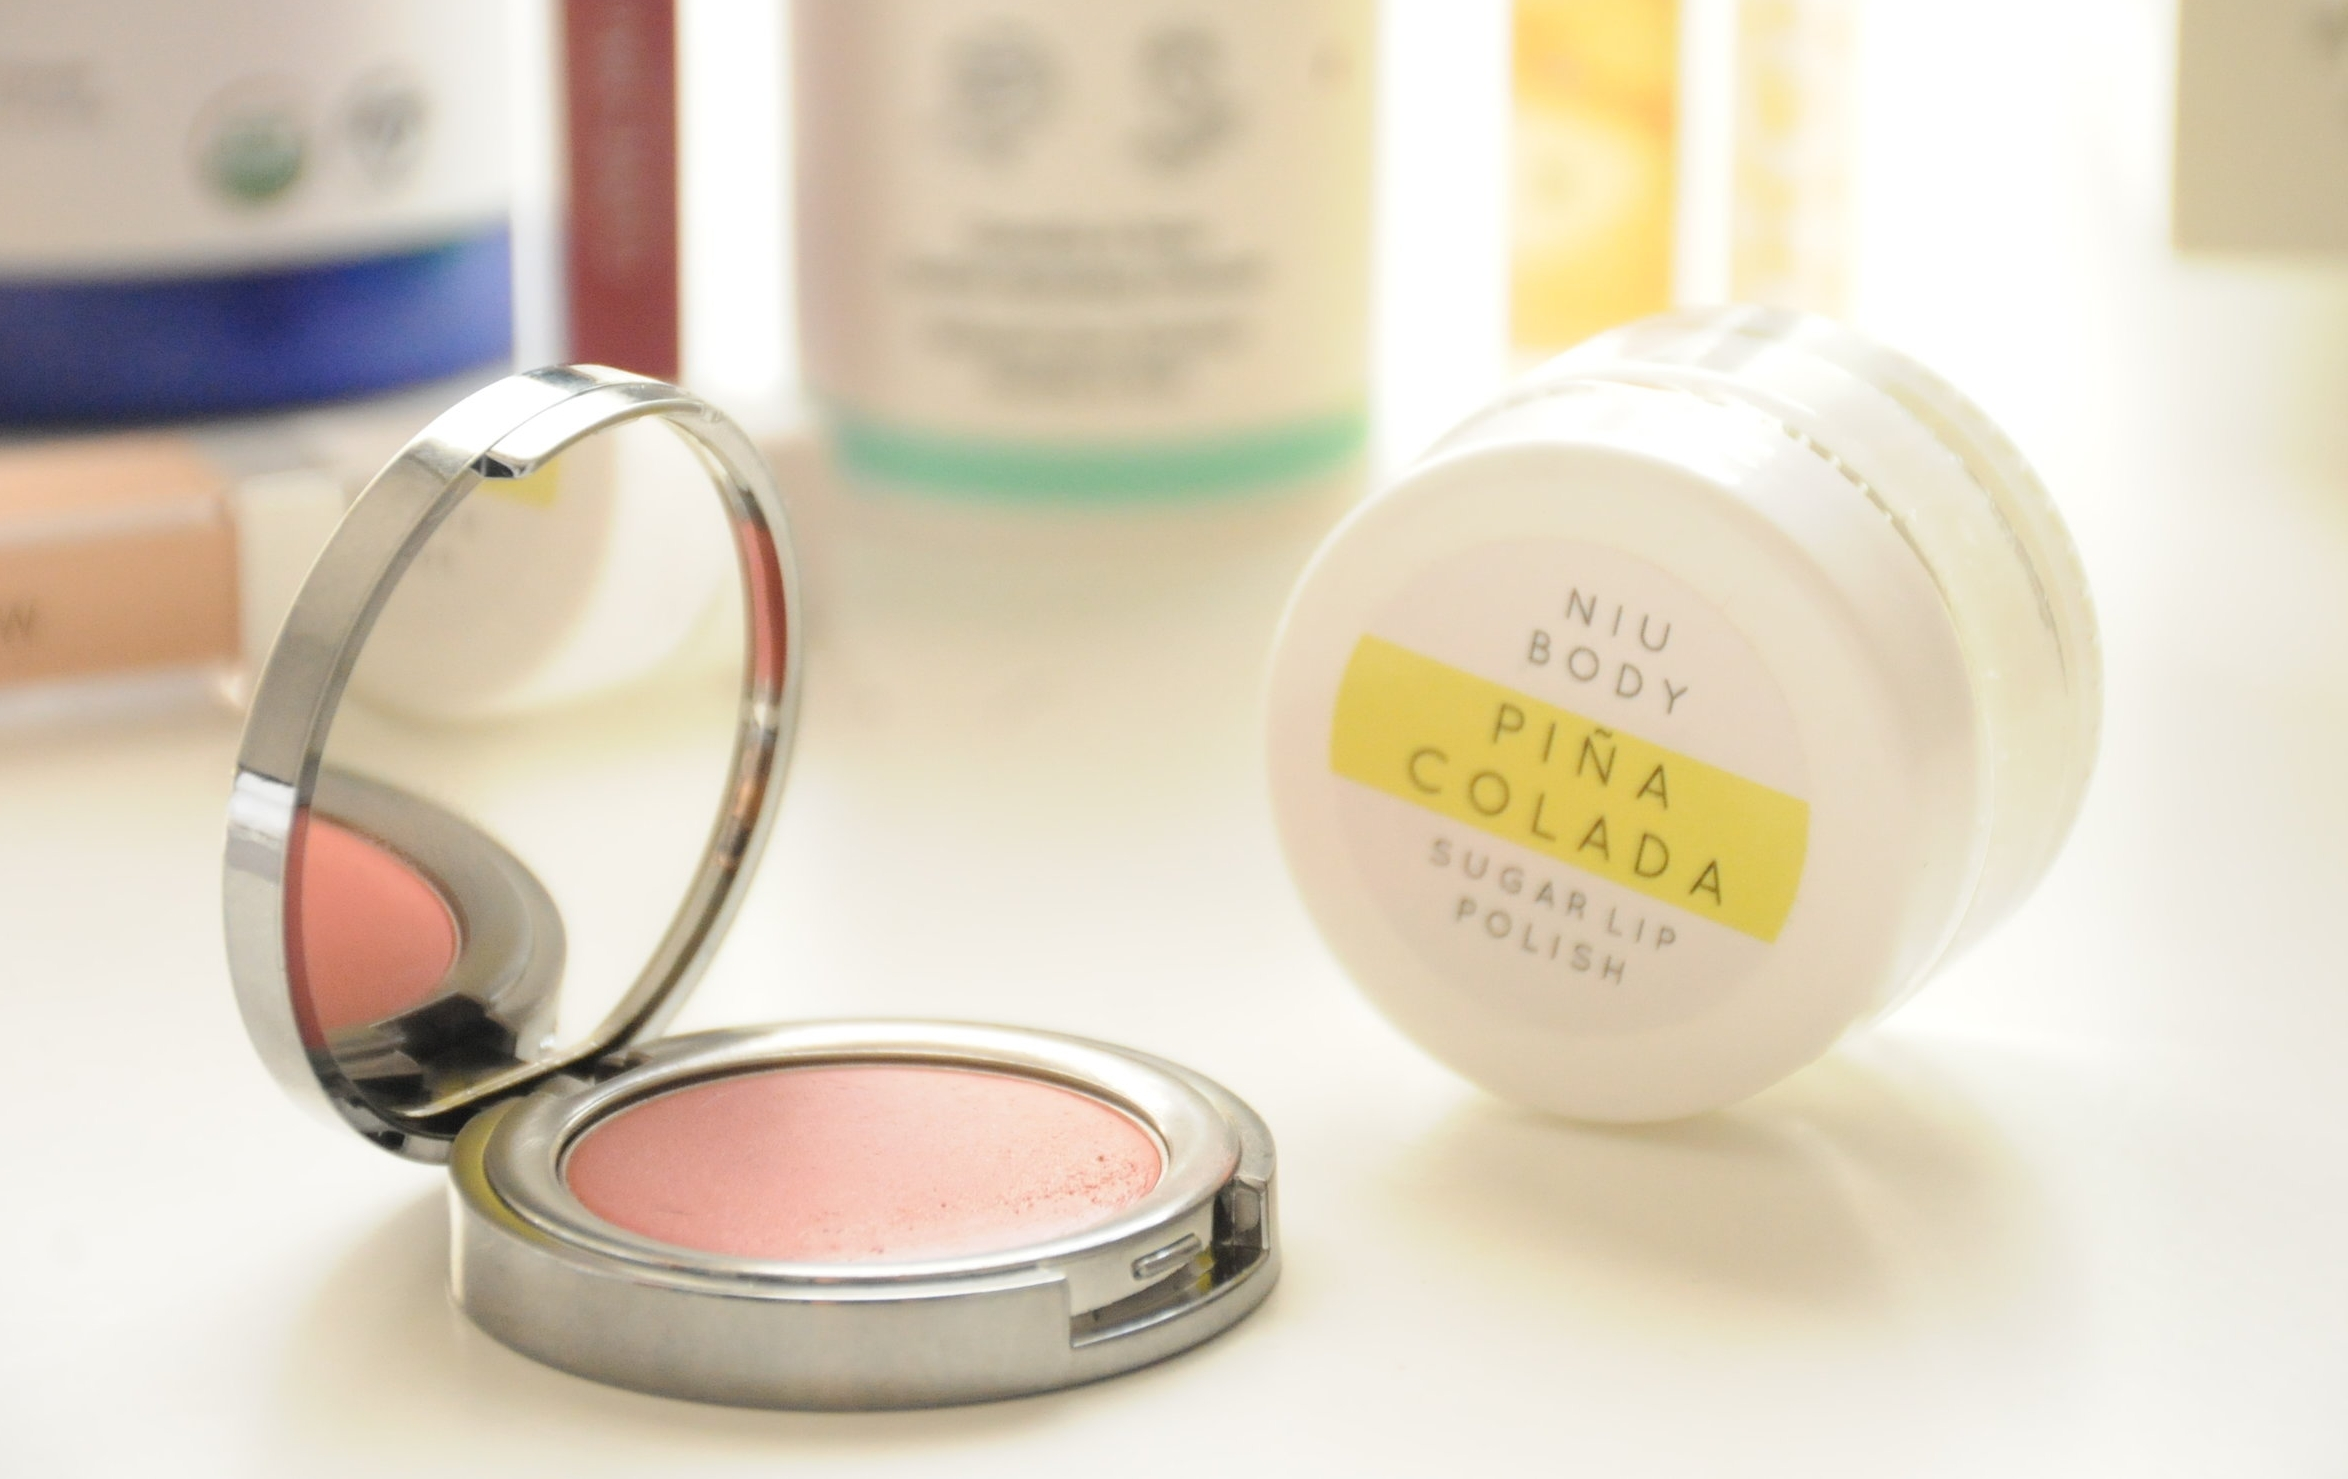 Juice Beauty Seashell 02 Niu Body Pina Colada